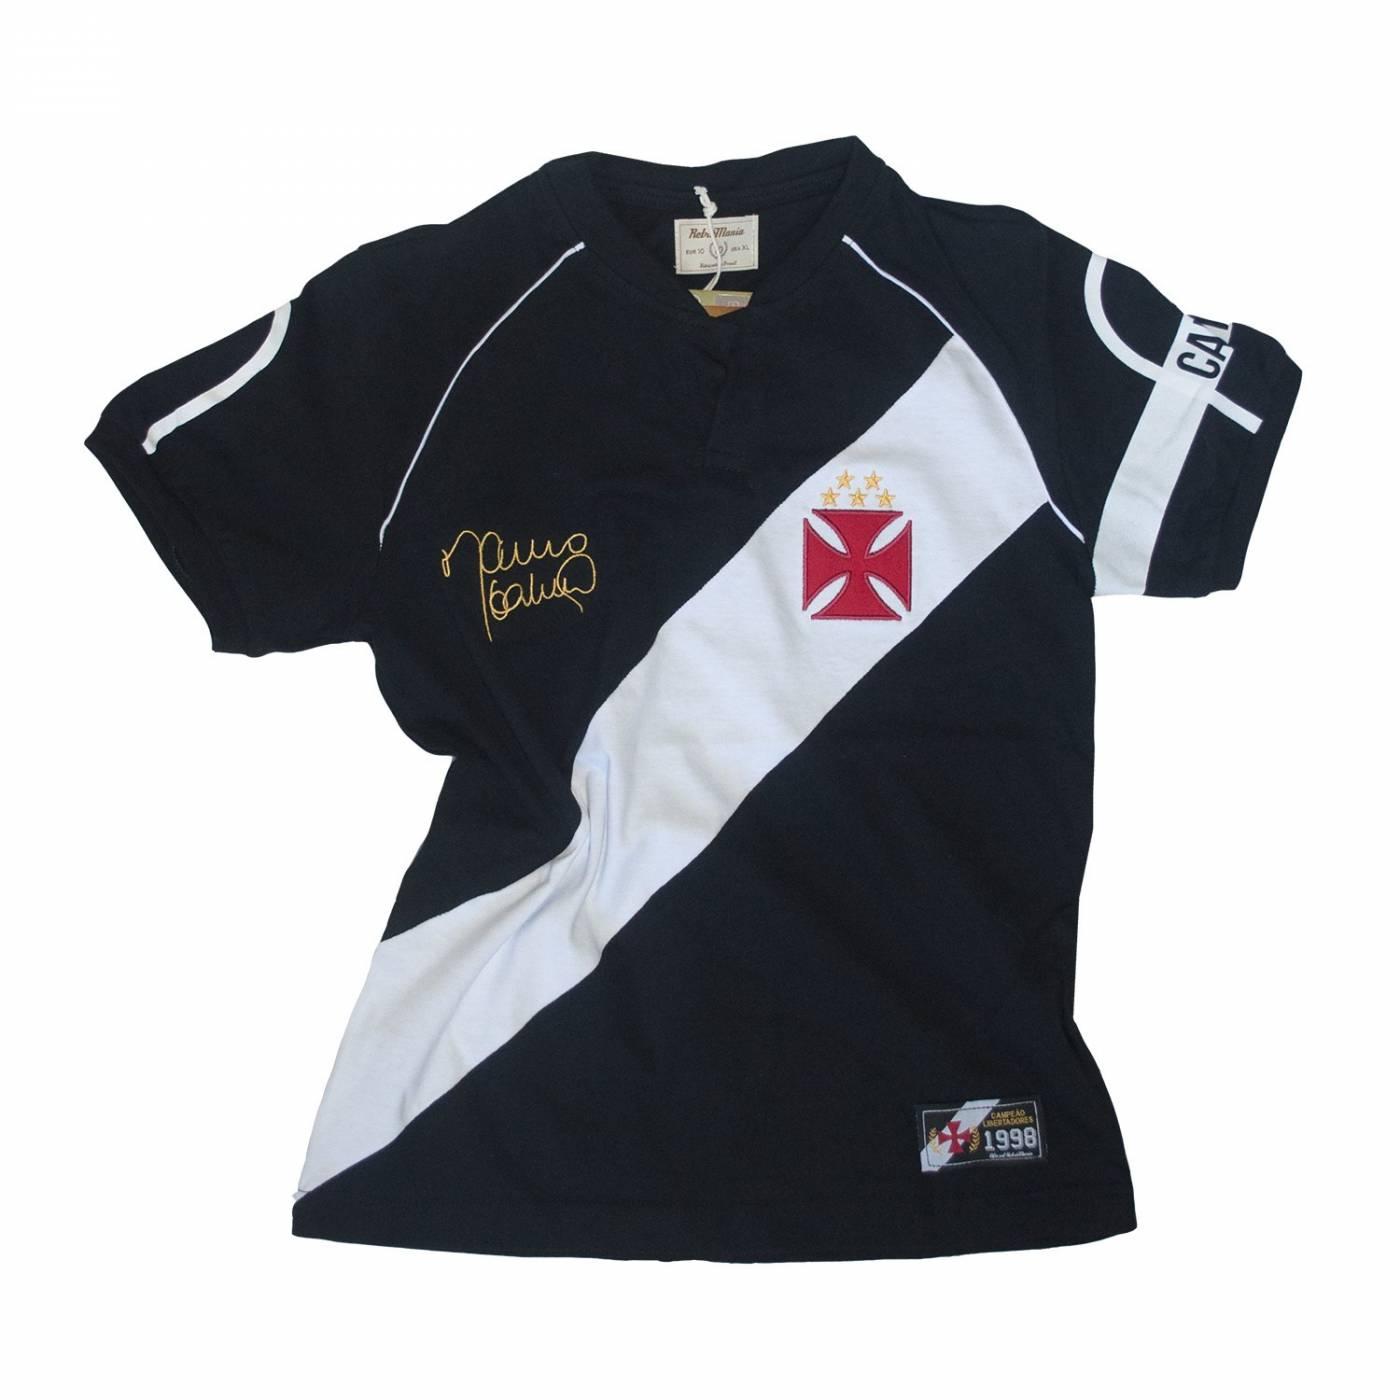 Camisa Vasco juvenil retrô 1998 - Mauro Galvão